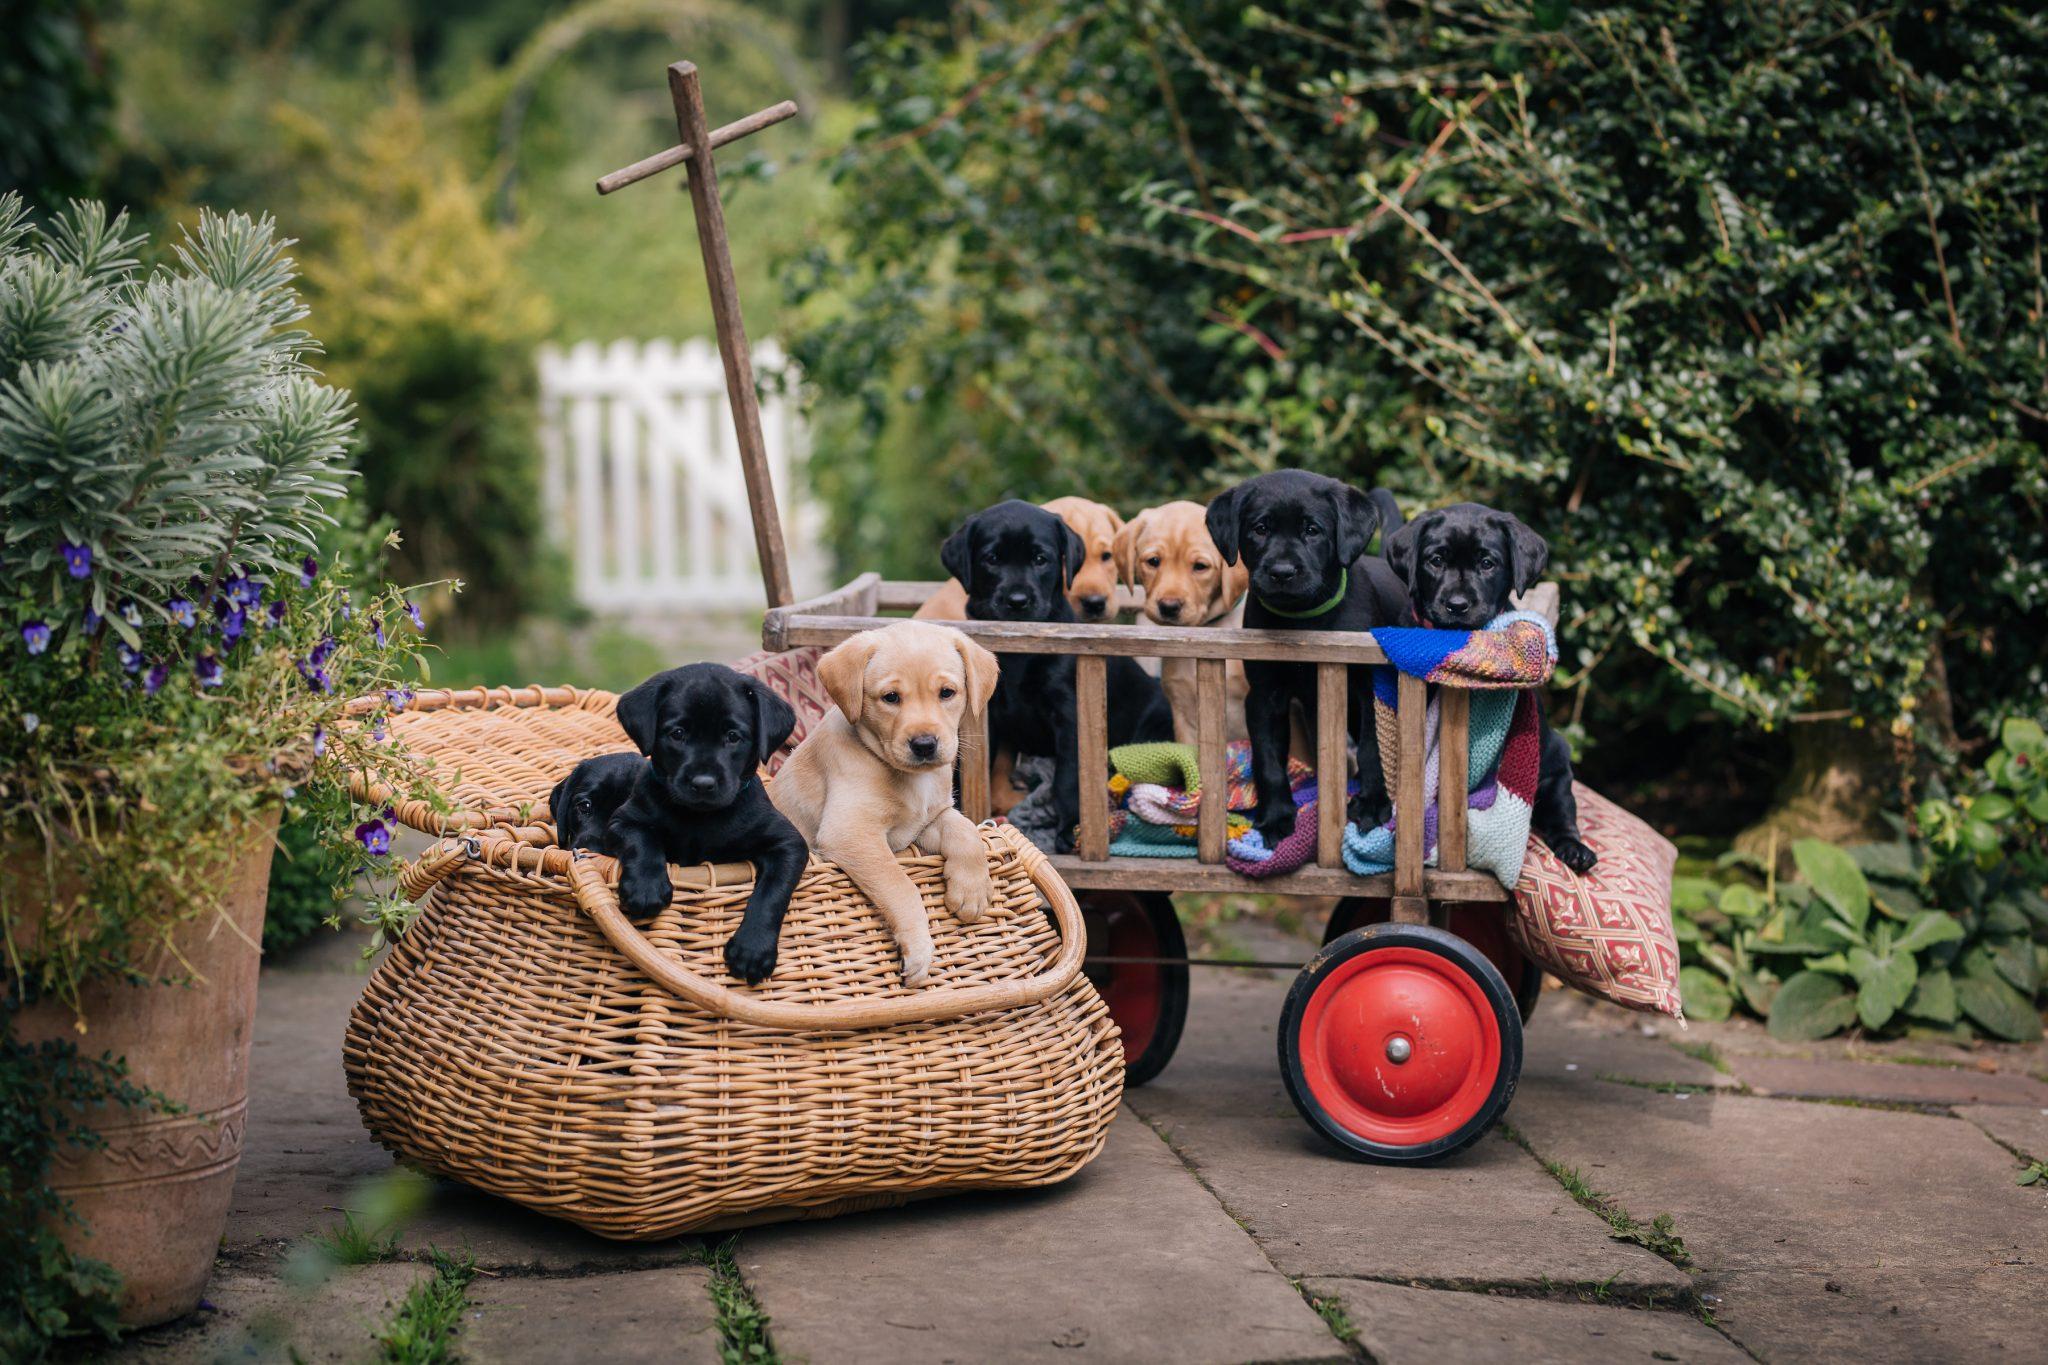 Labrador Puppies photographer Joanna Eardley